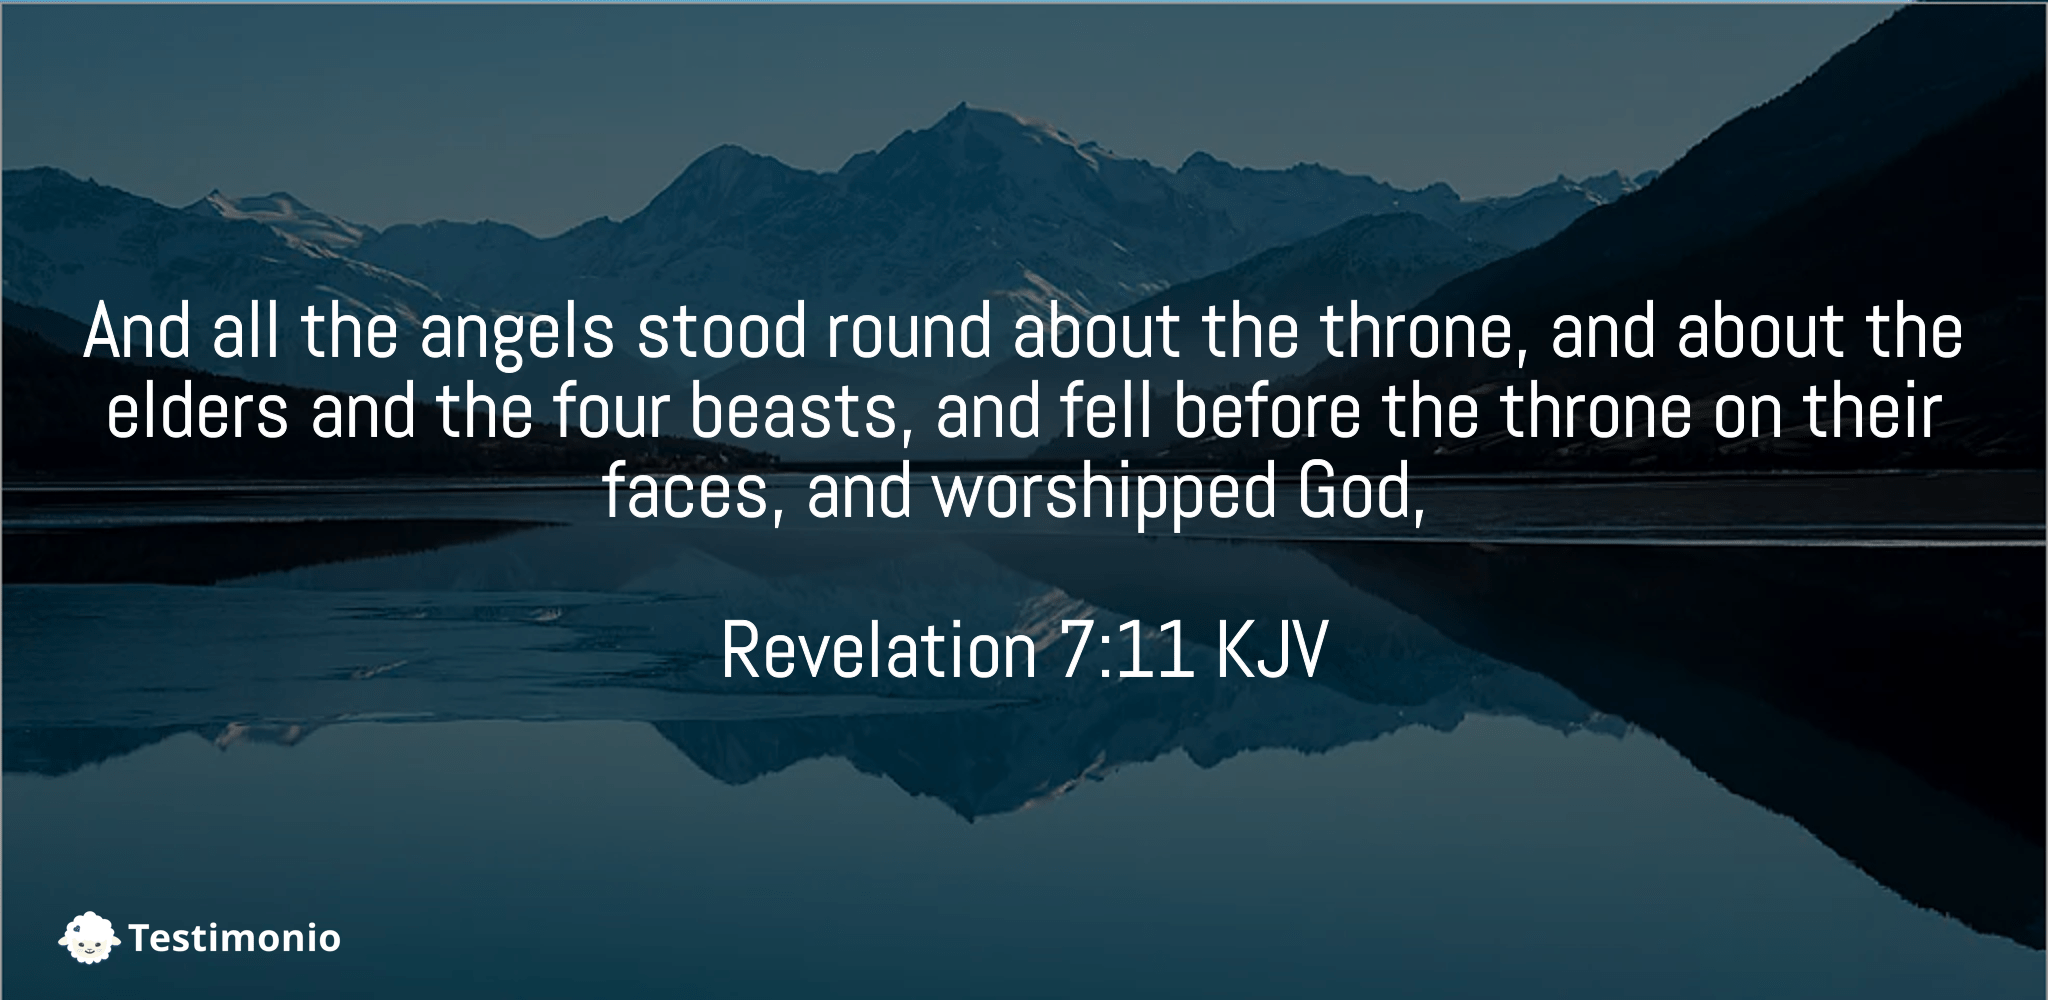 Revelation 7:11